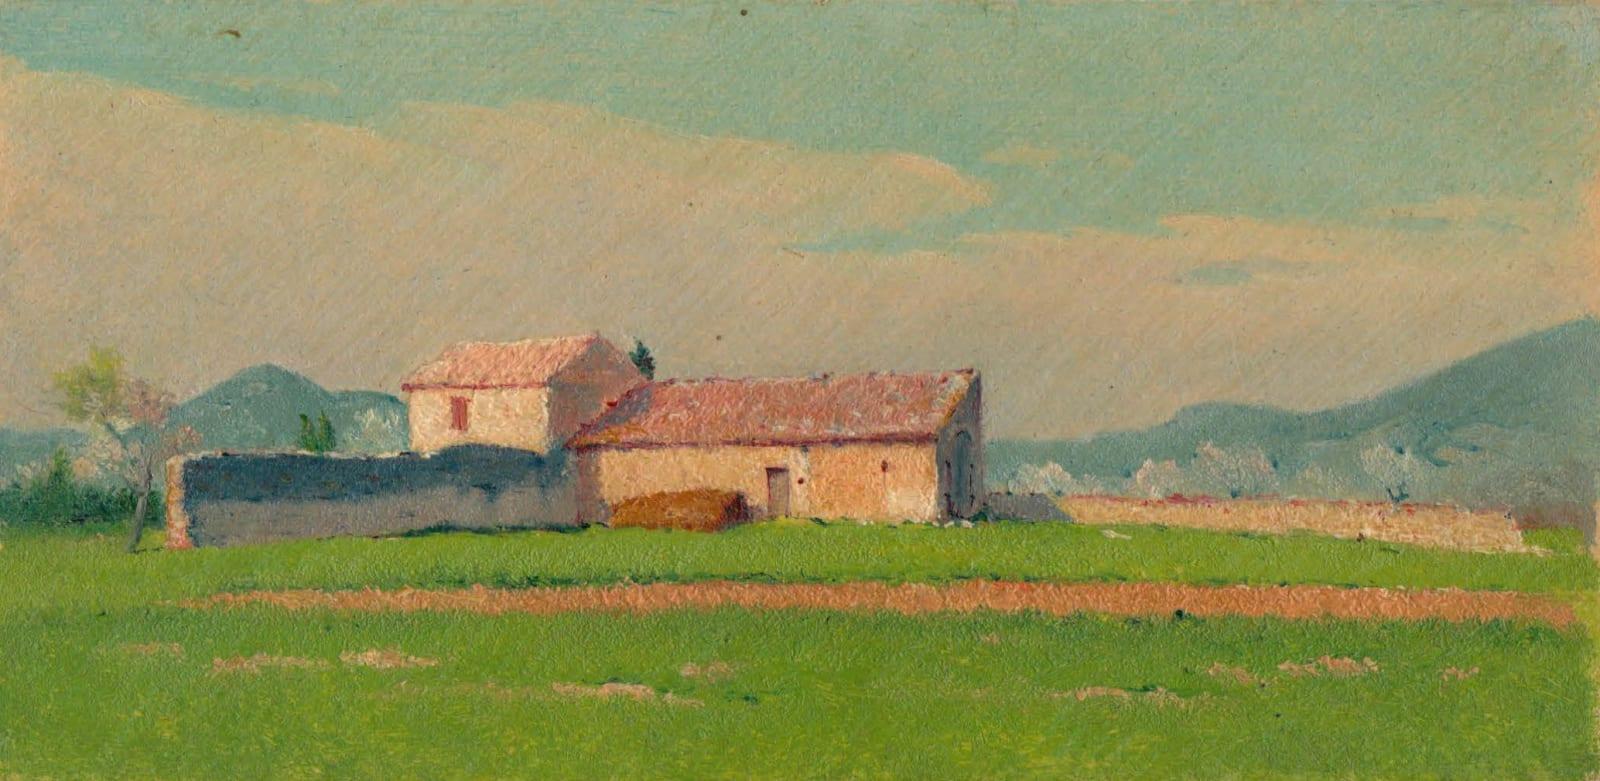 EDOUARD ATHÉNOSY, The abandoned farmhouse, 1915